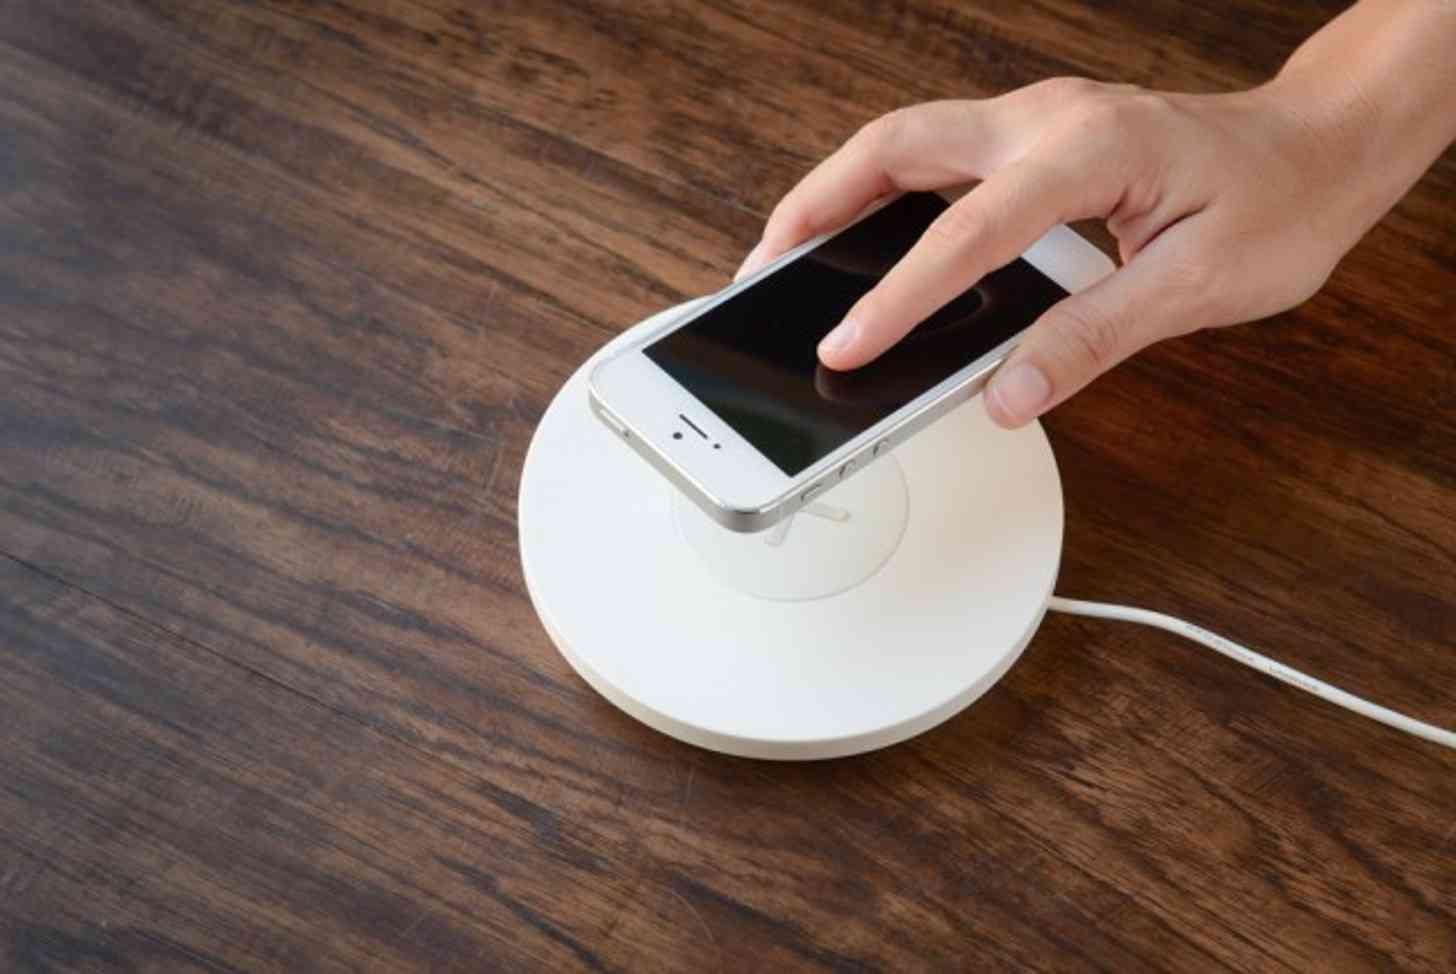 Apple iPhone wireless charging